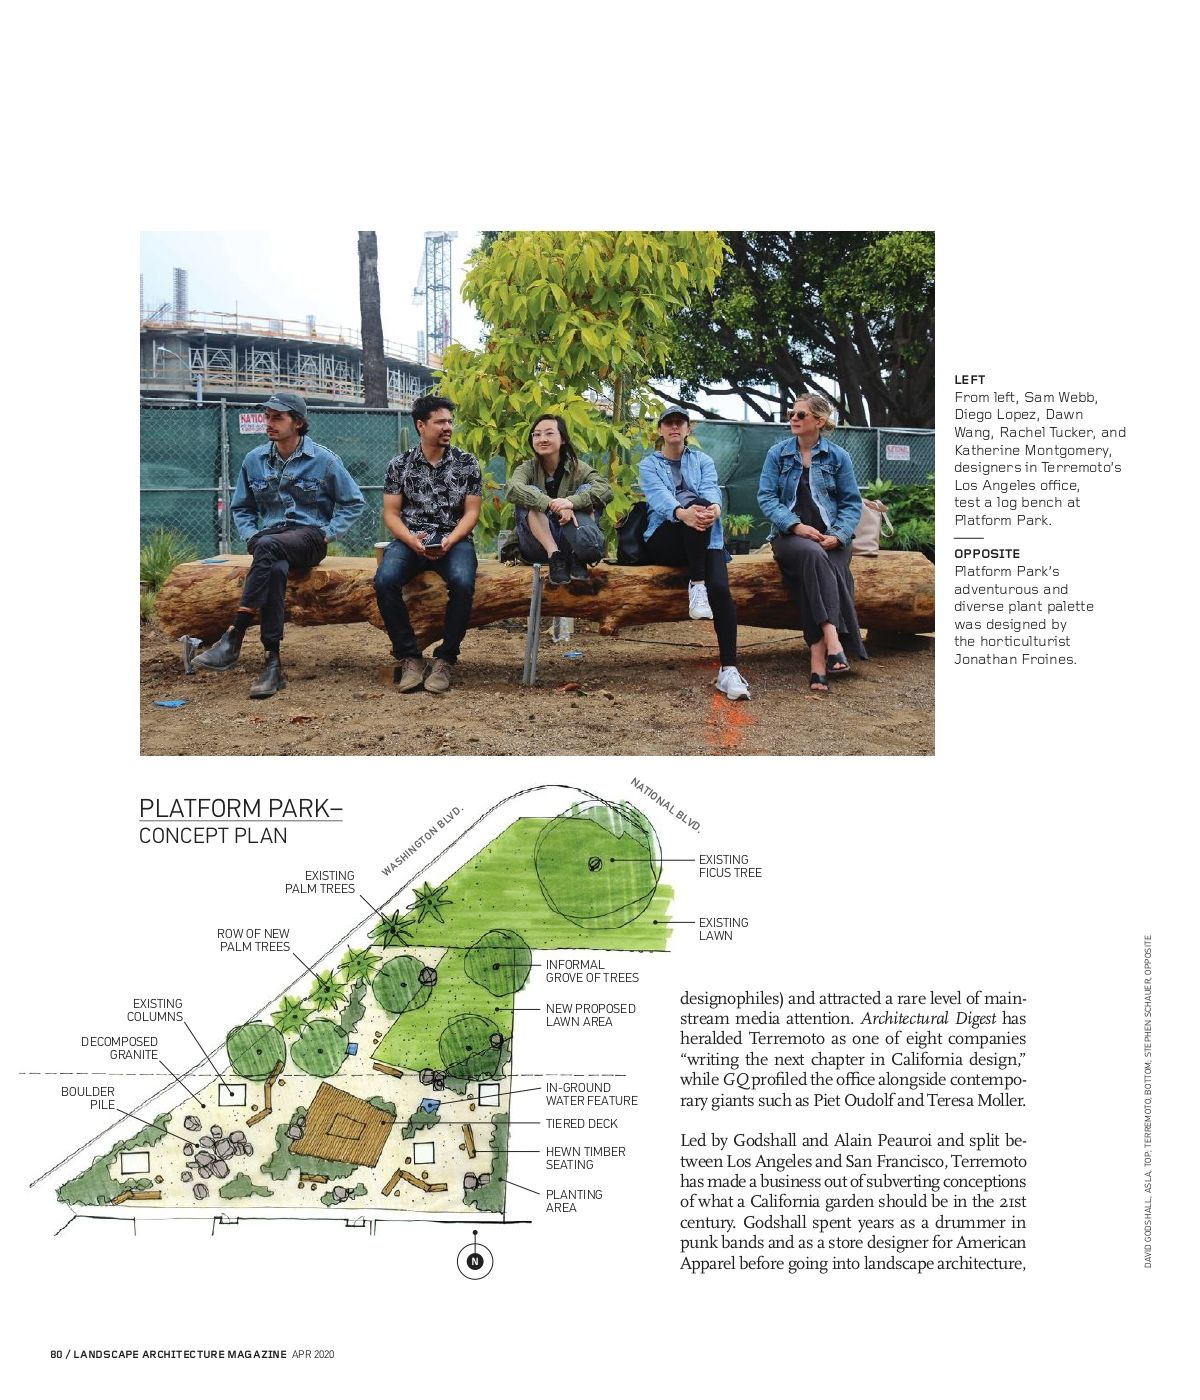 Pin By Yulia Vlasenko On Landscape Design In 2020 Landscape Architecture Magazine Ground Water Feature Architecture Magazines